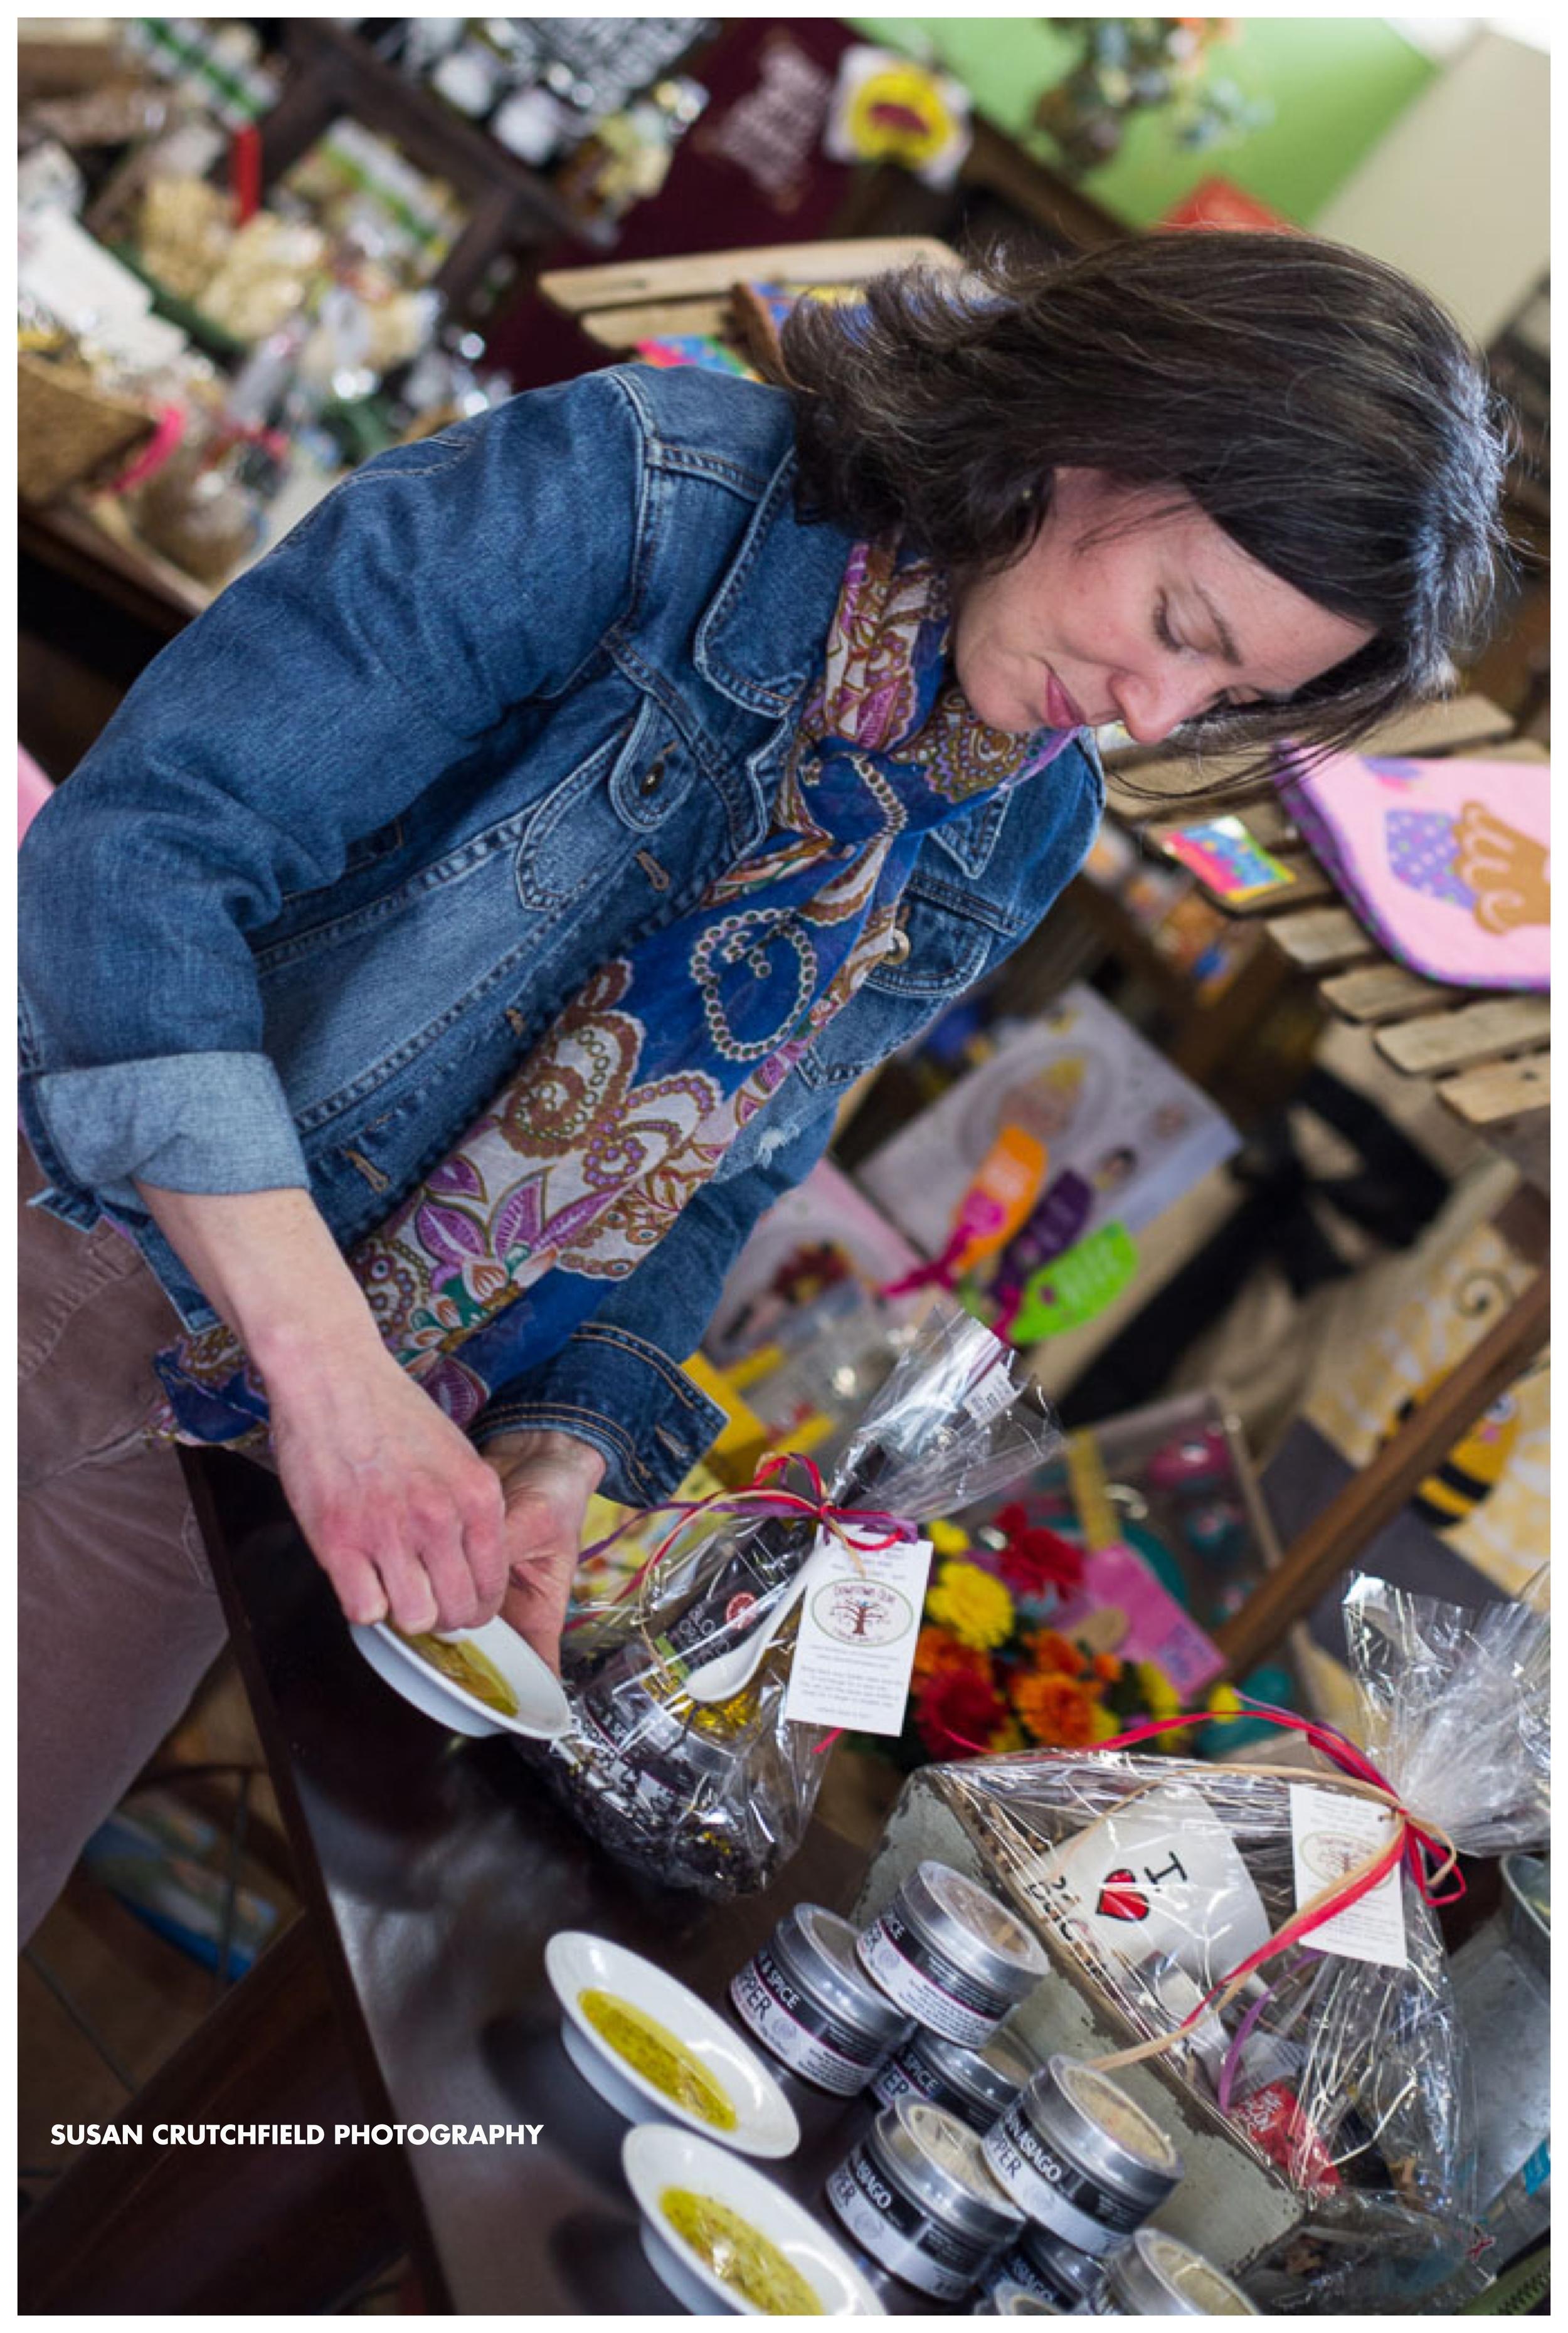 Downtown Olive & Kitchen Supply Co. Newnan, GA Photo © 2015 Susan Crutchfield Photography